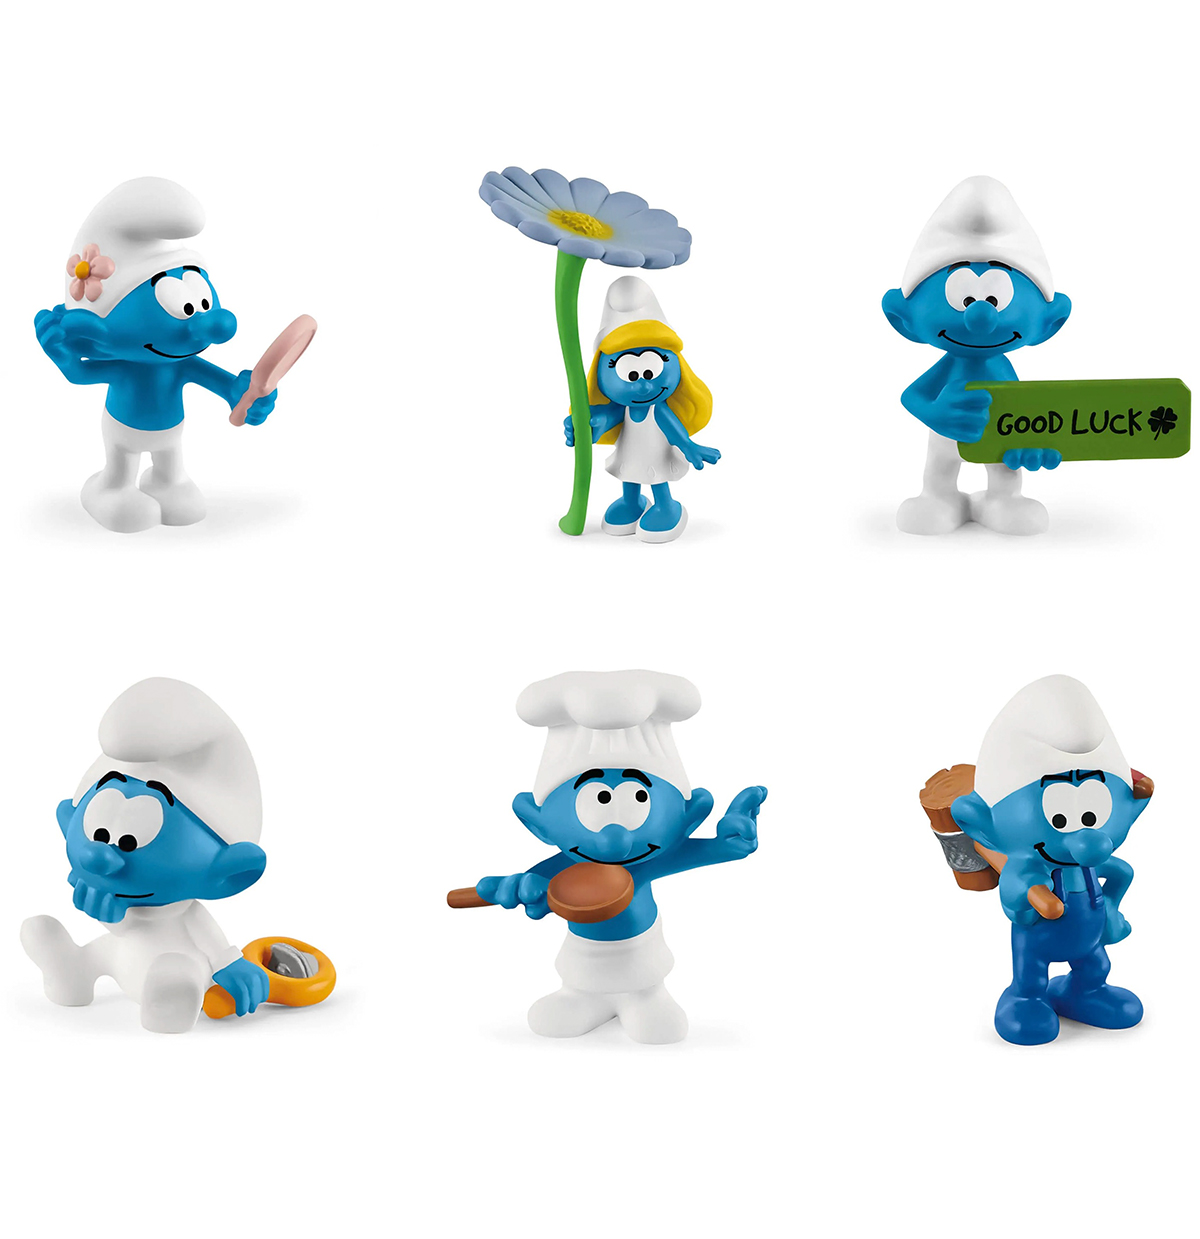 The Smurfs figures